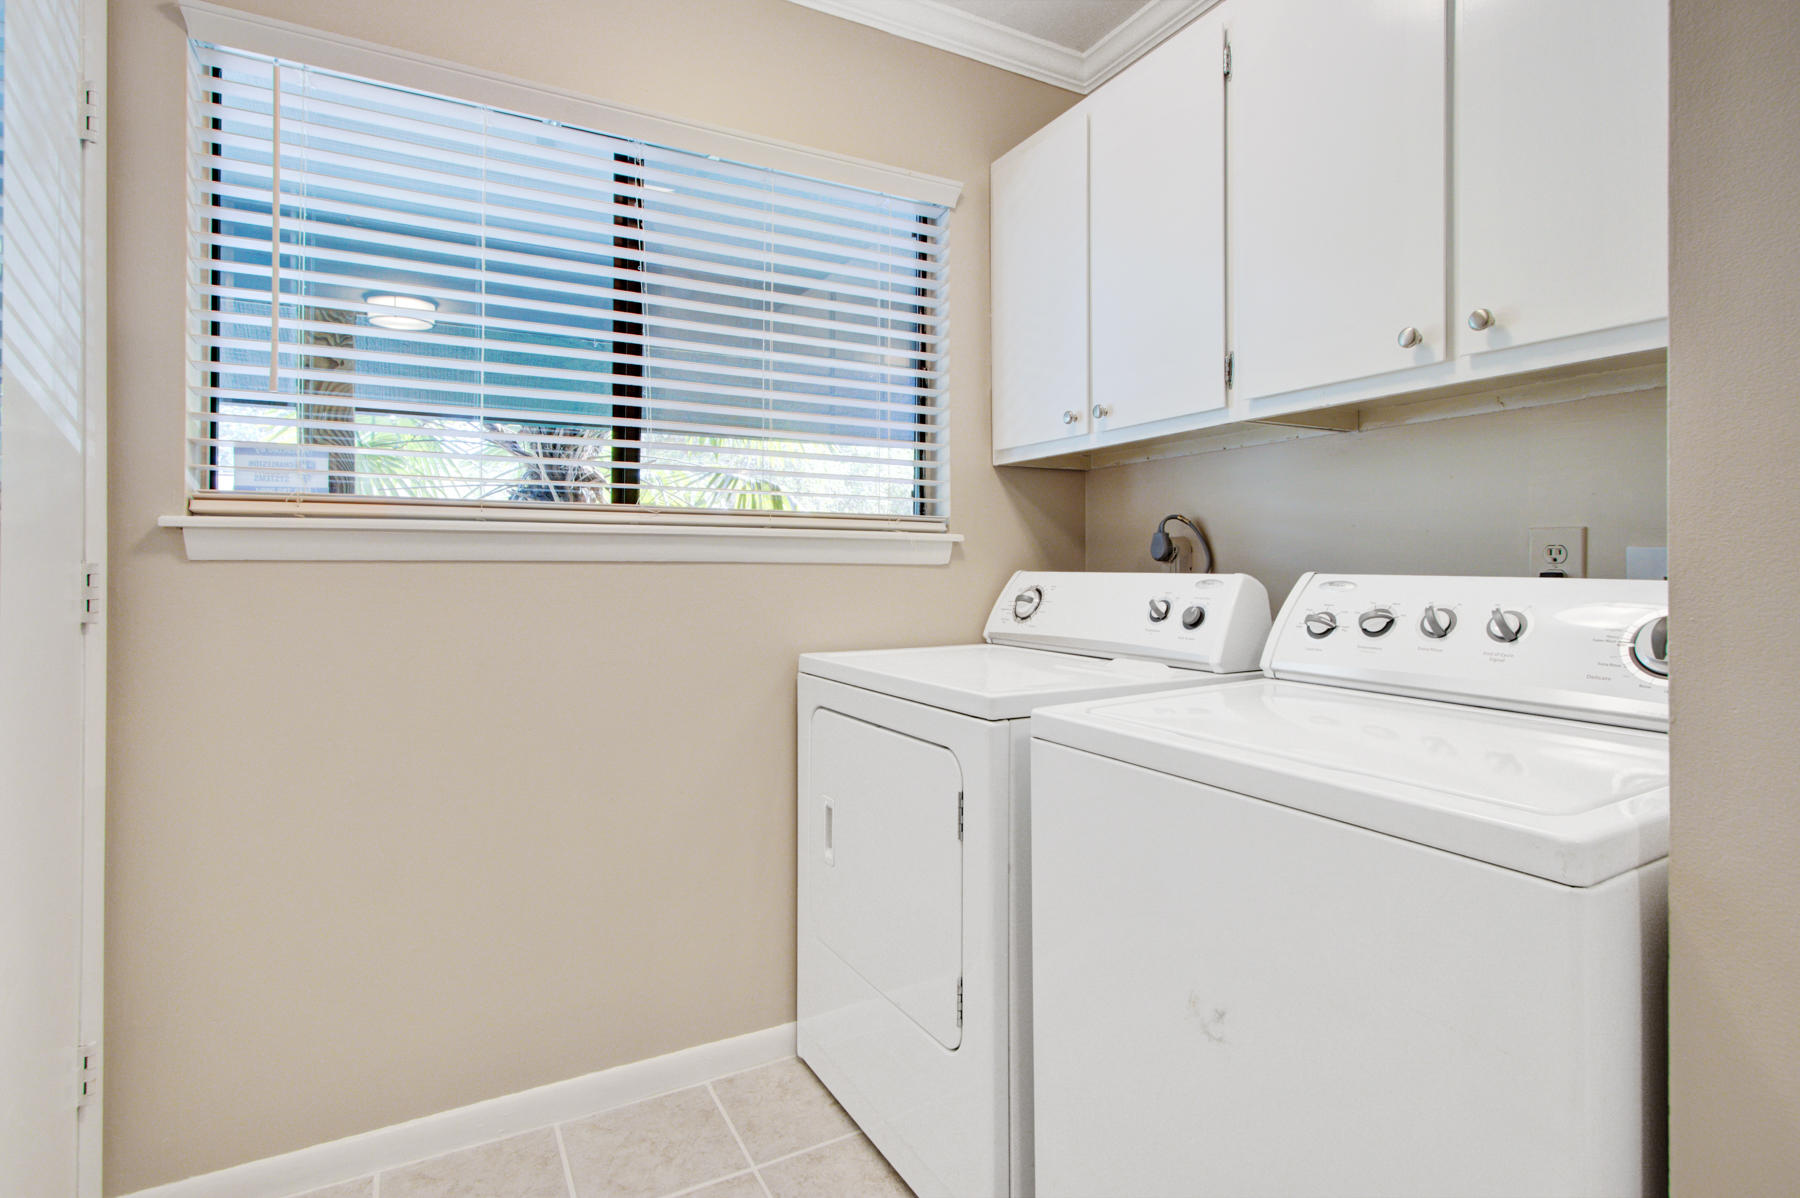 Snee Farm Lakes Homes For Sale - 1120 Hidden Cove, Mount Pleasant, SC - 9